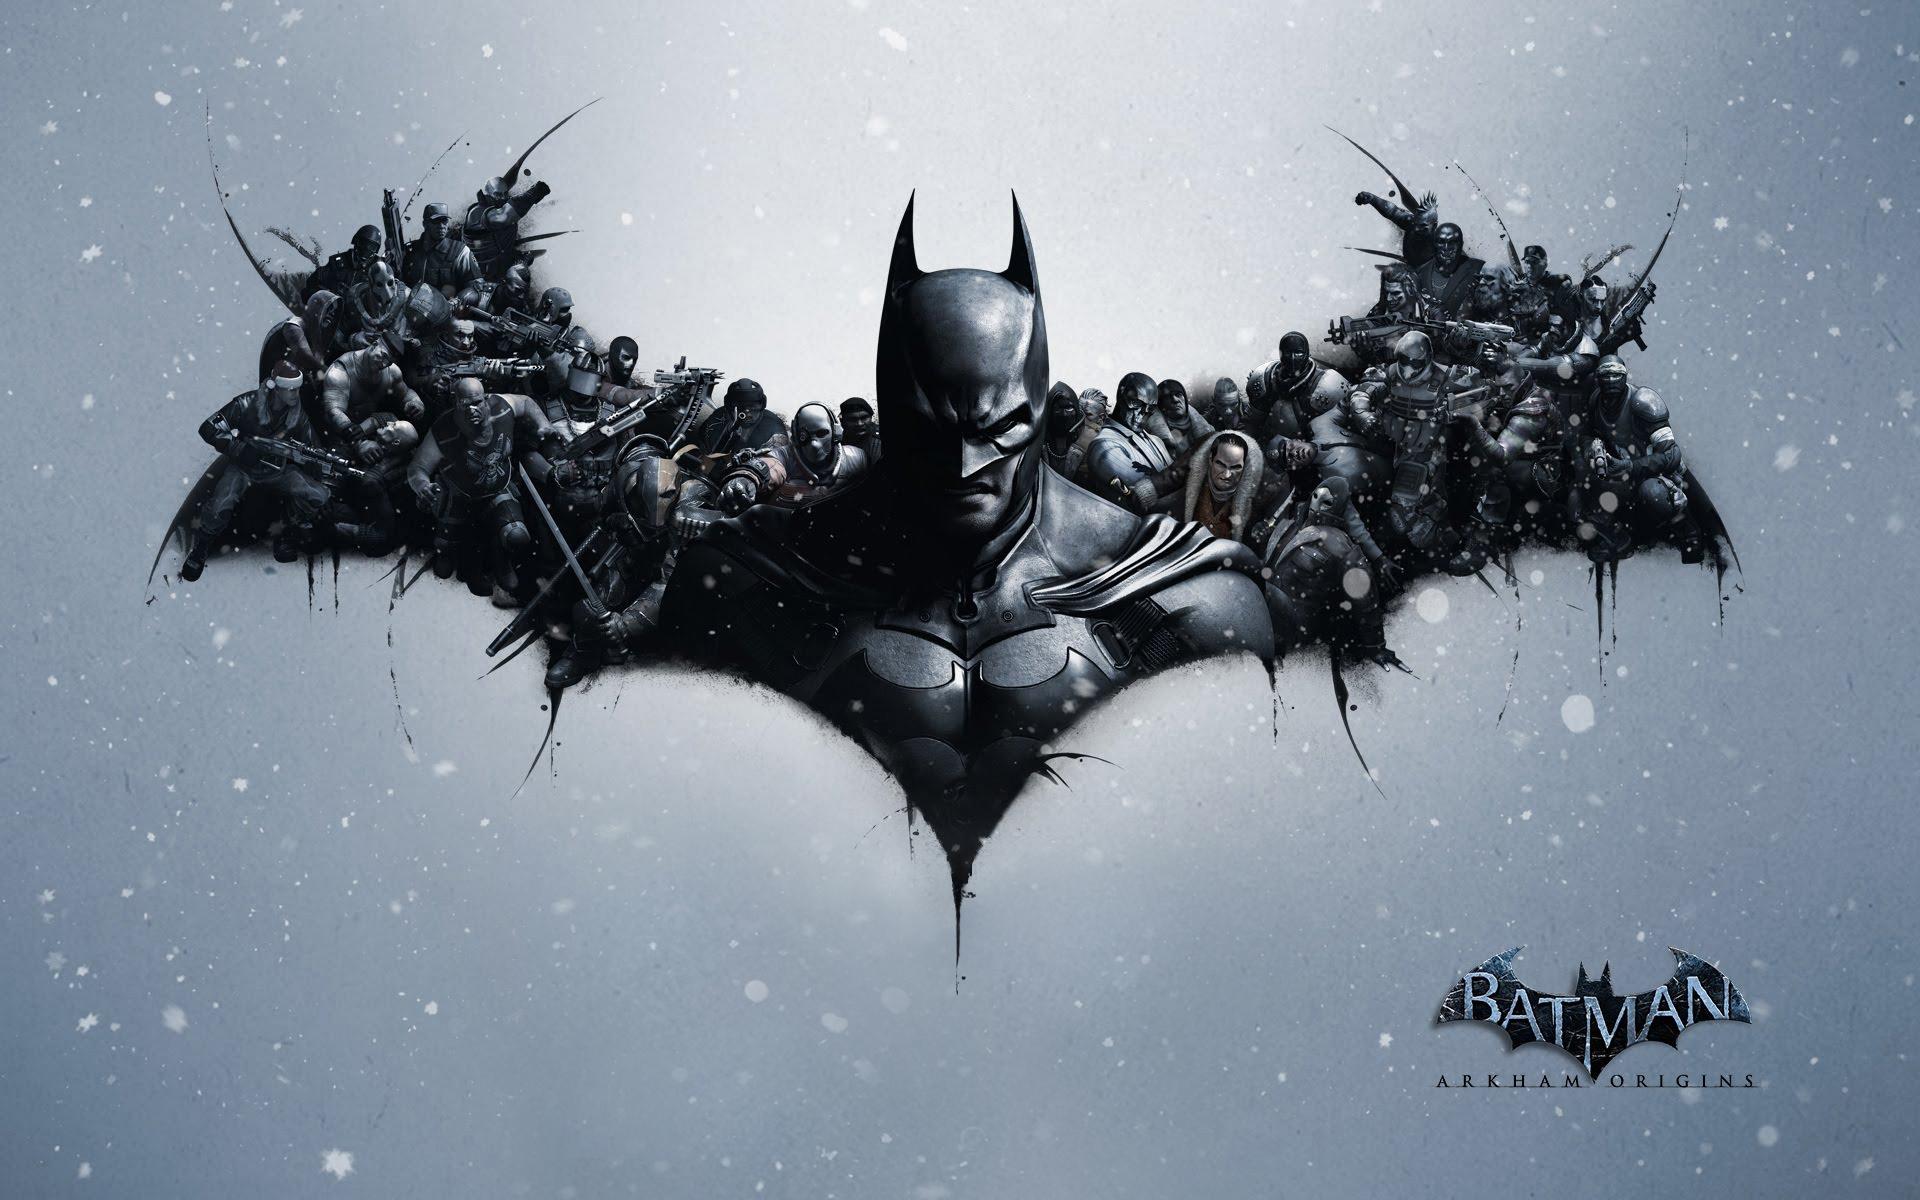 Download Batman Arkham Origins Games HD Wallpapers 5718 Full Size 1920x1200